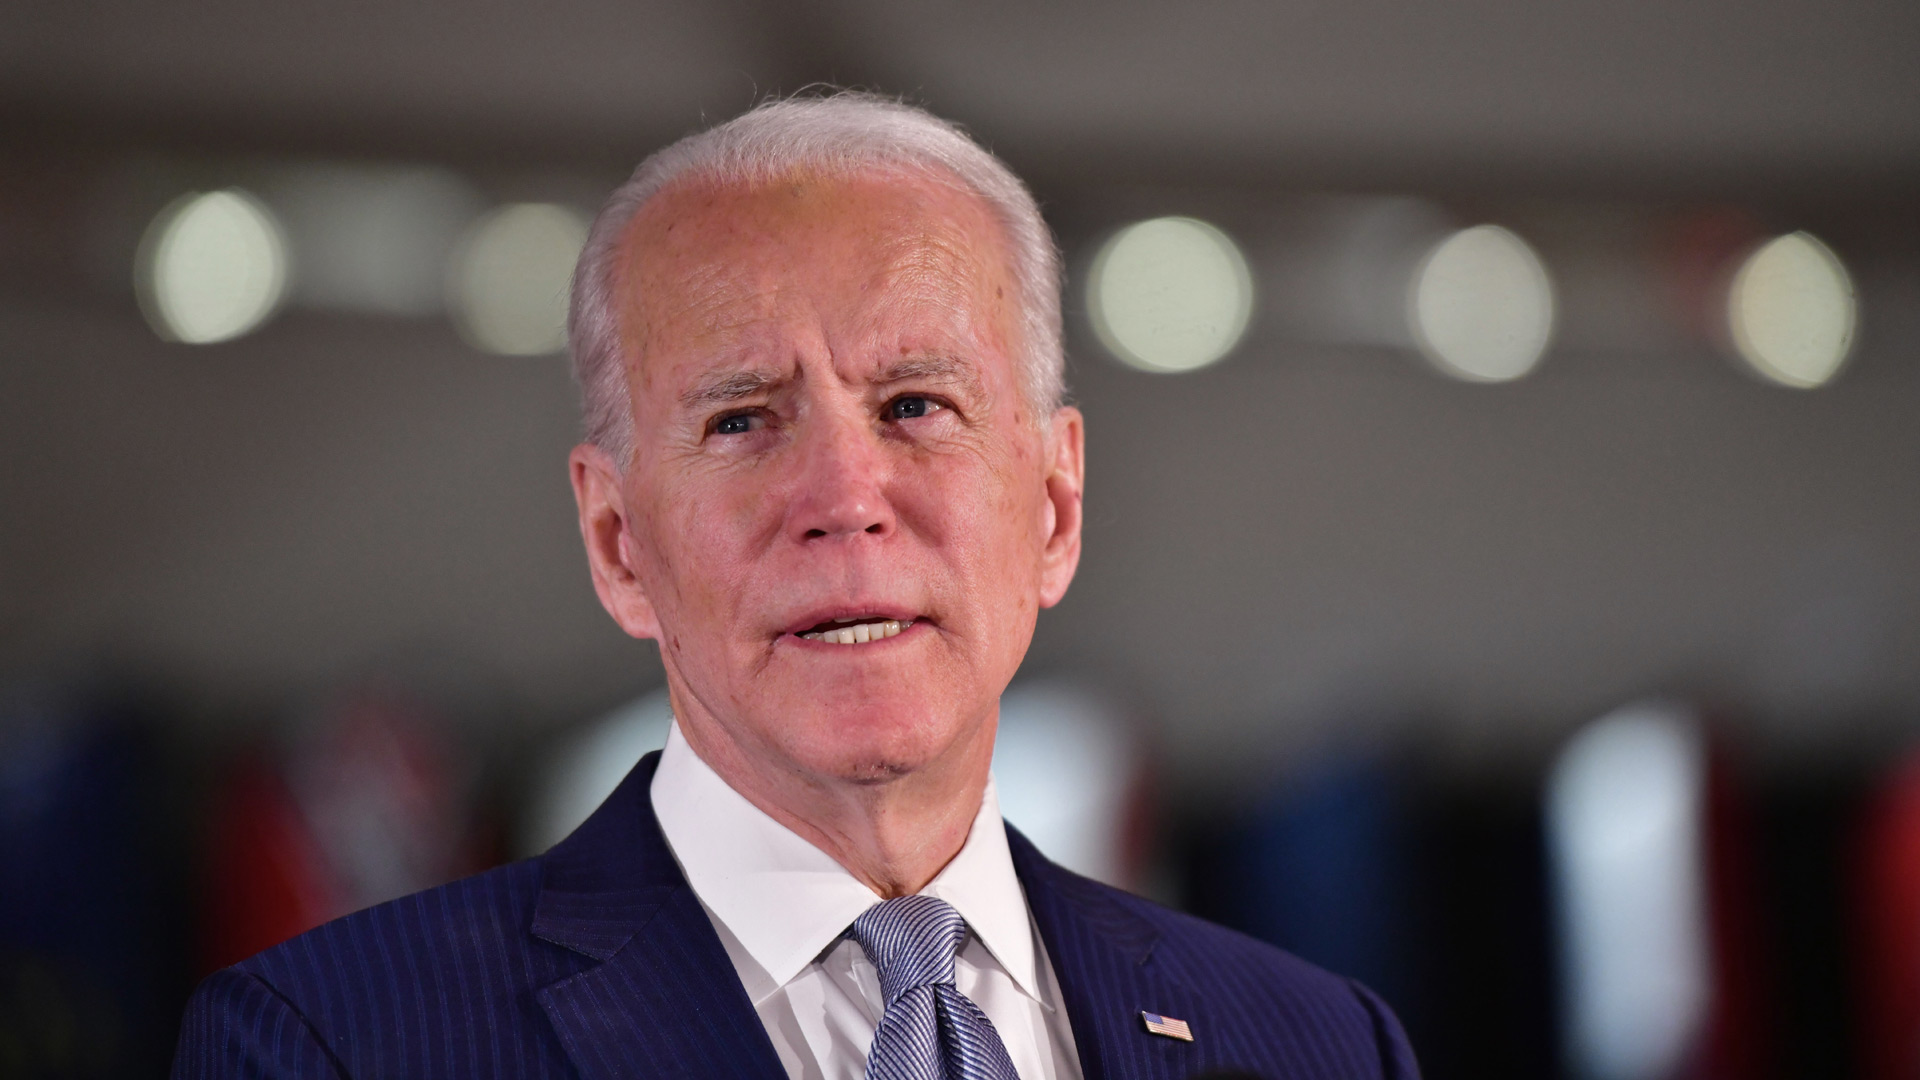 Joe Biden (Photo by Mark Makela/Getty Images)